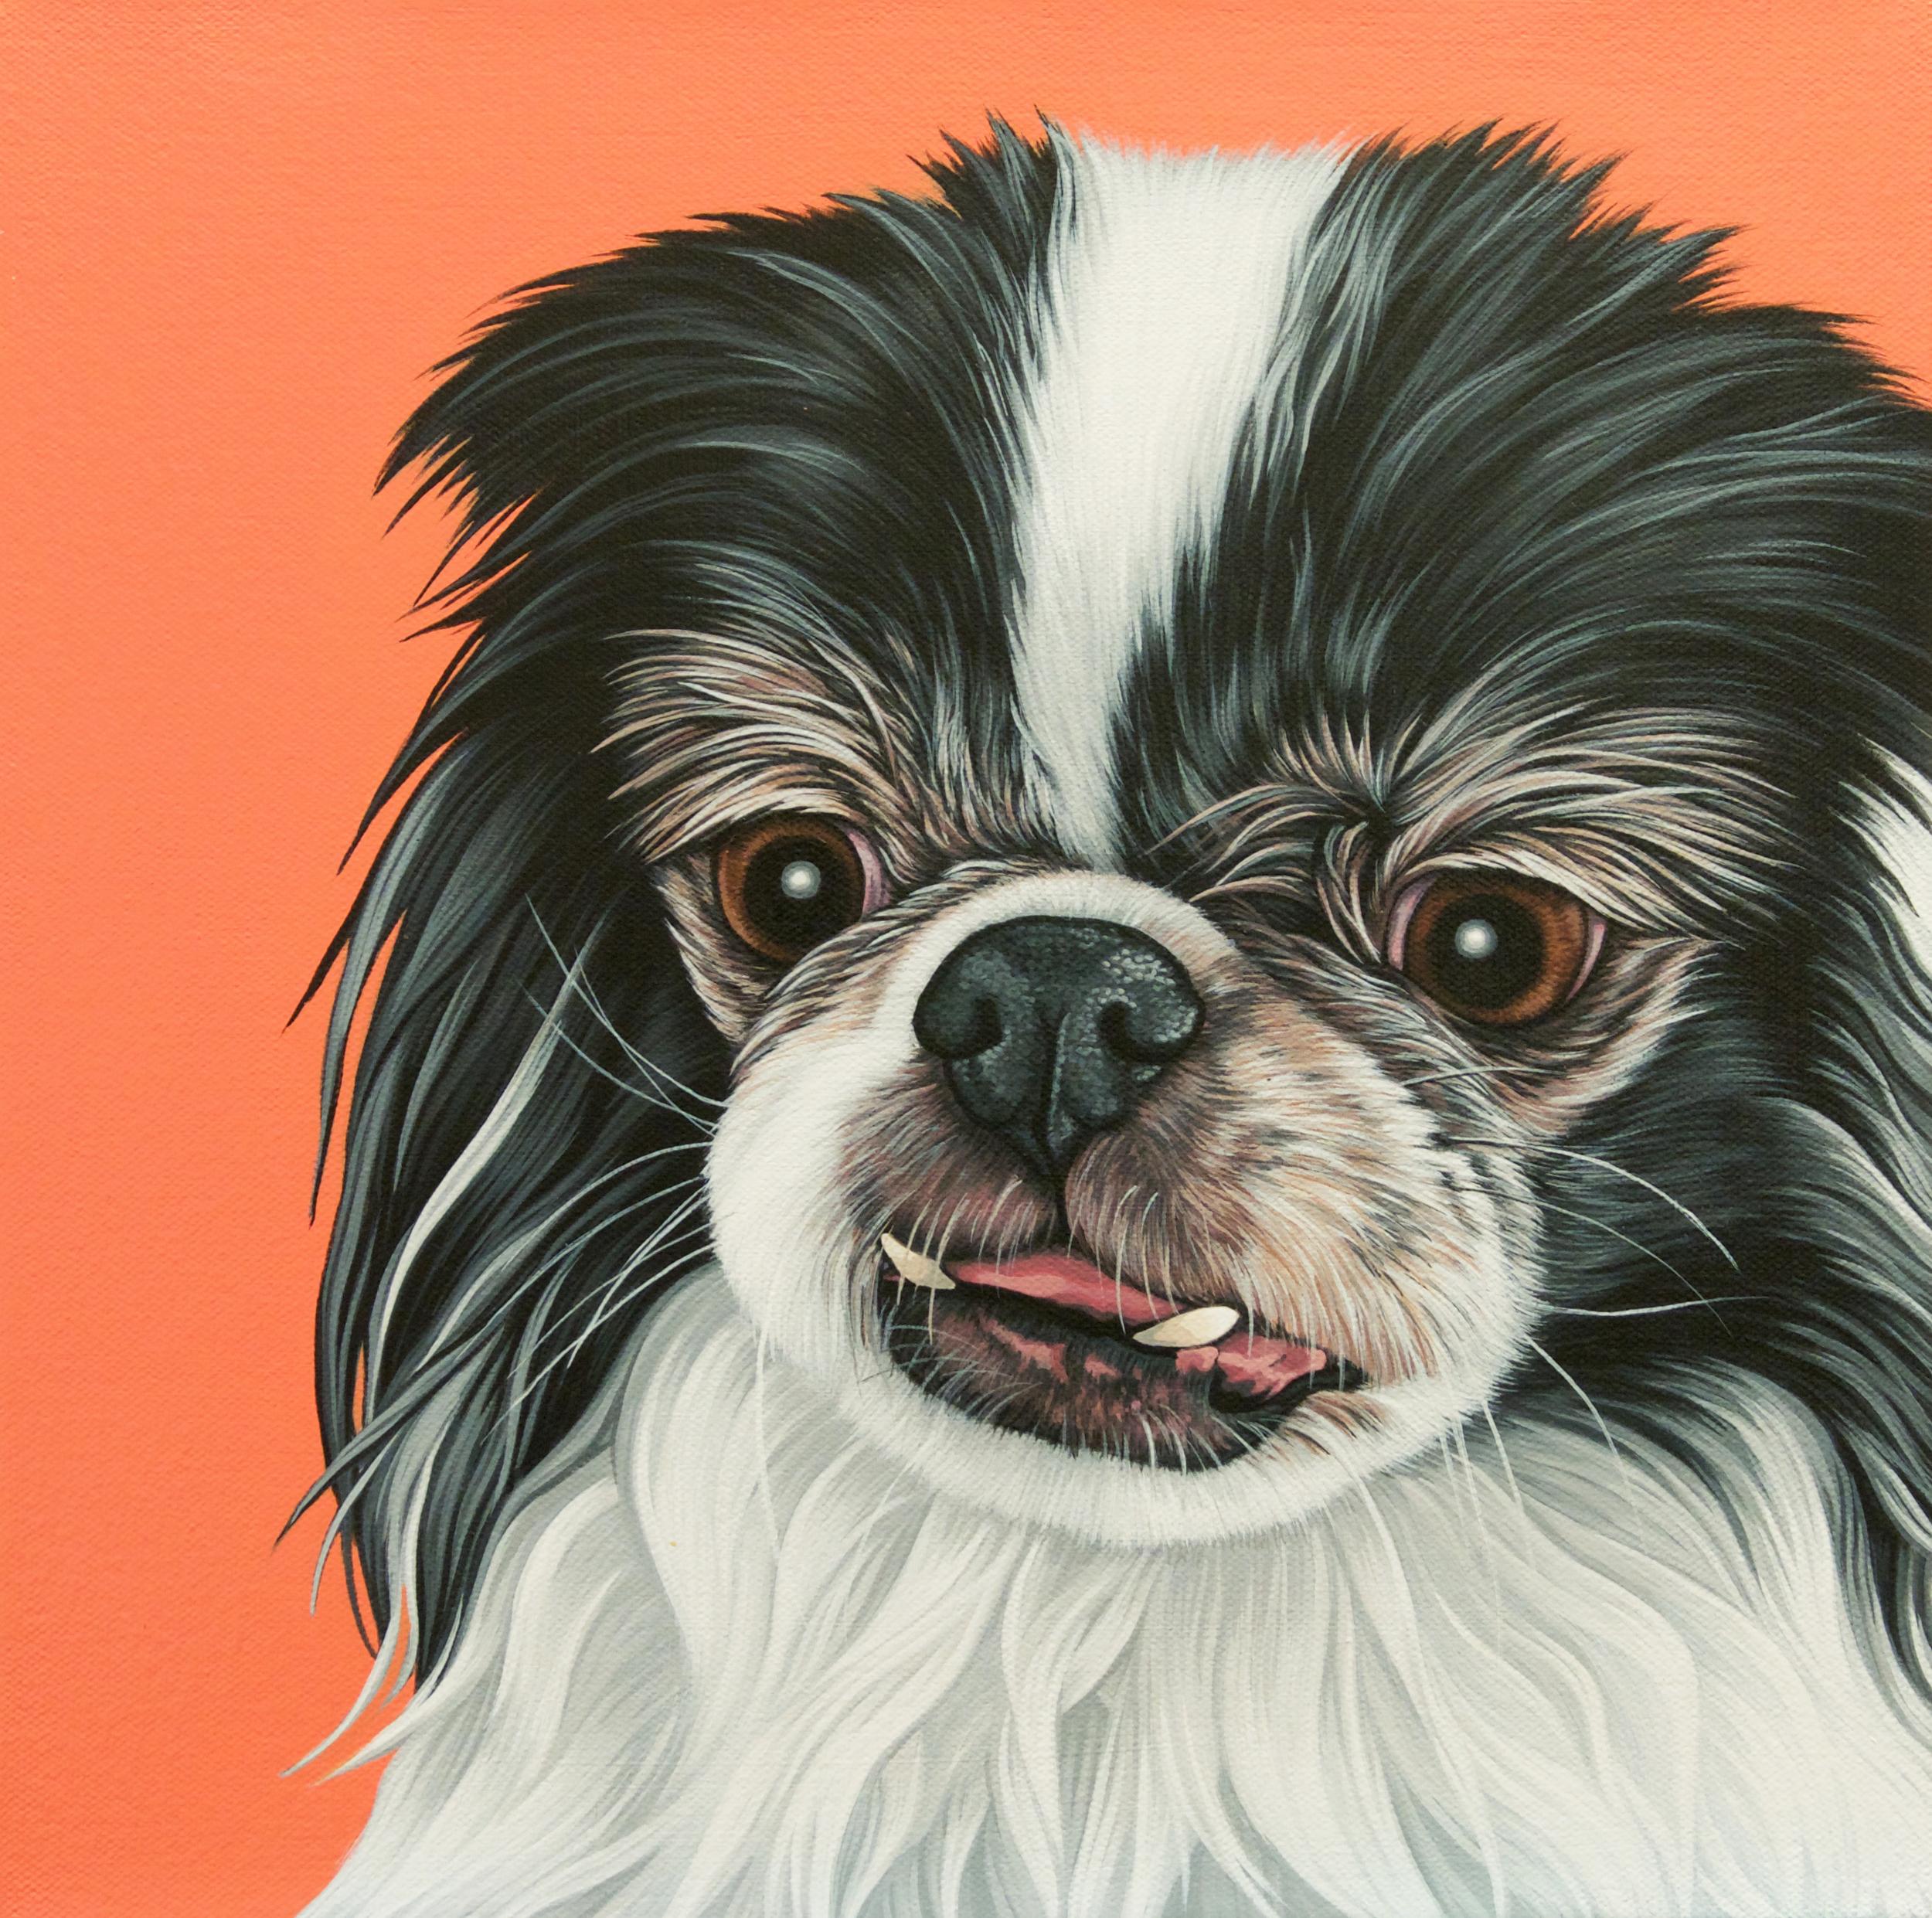 """Melody"", latex enamel on canvas, 12""x 12"", 2016"